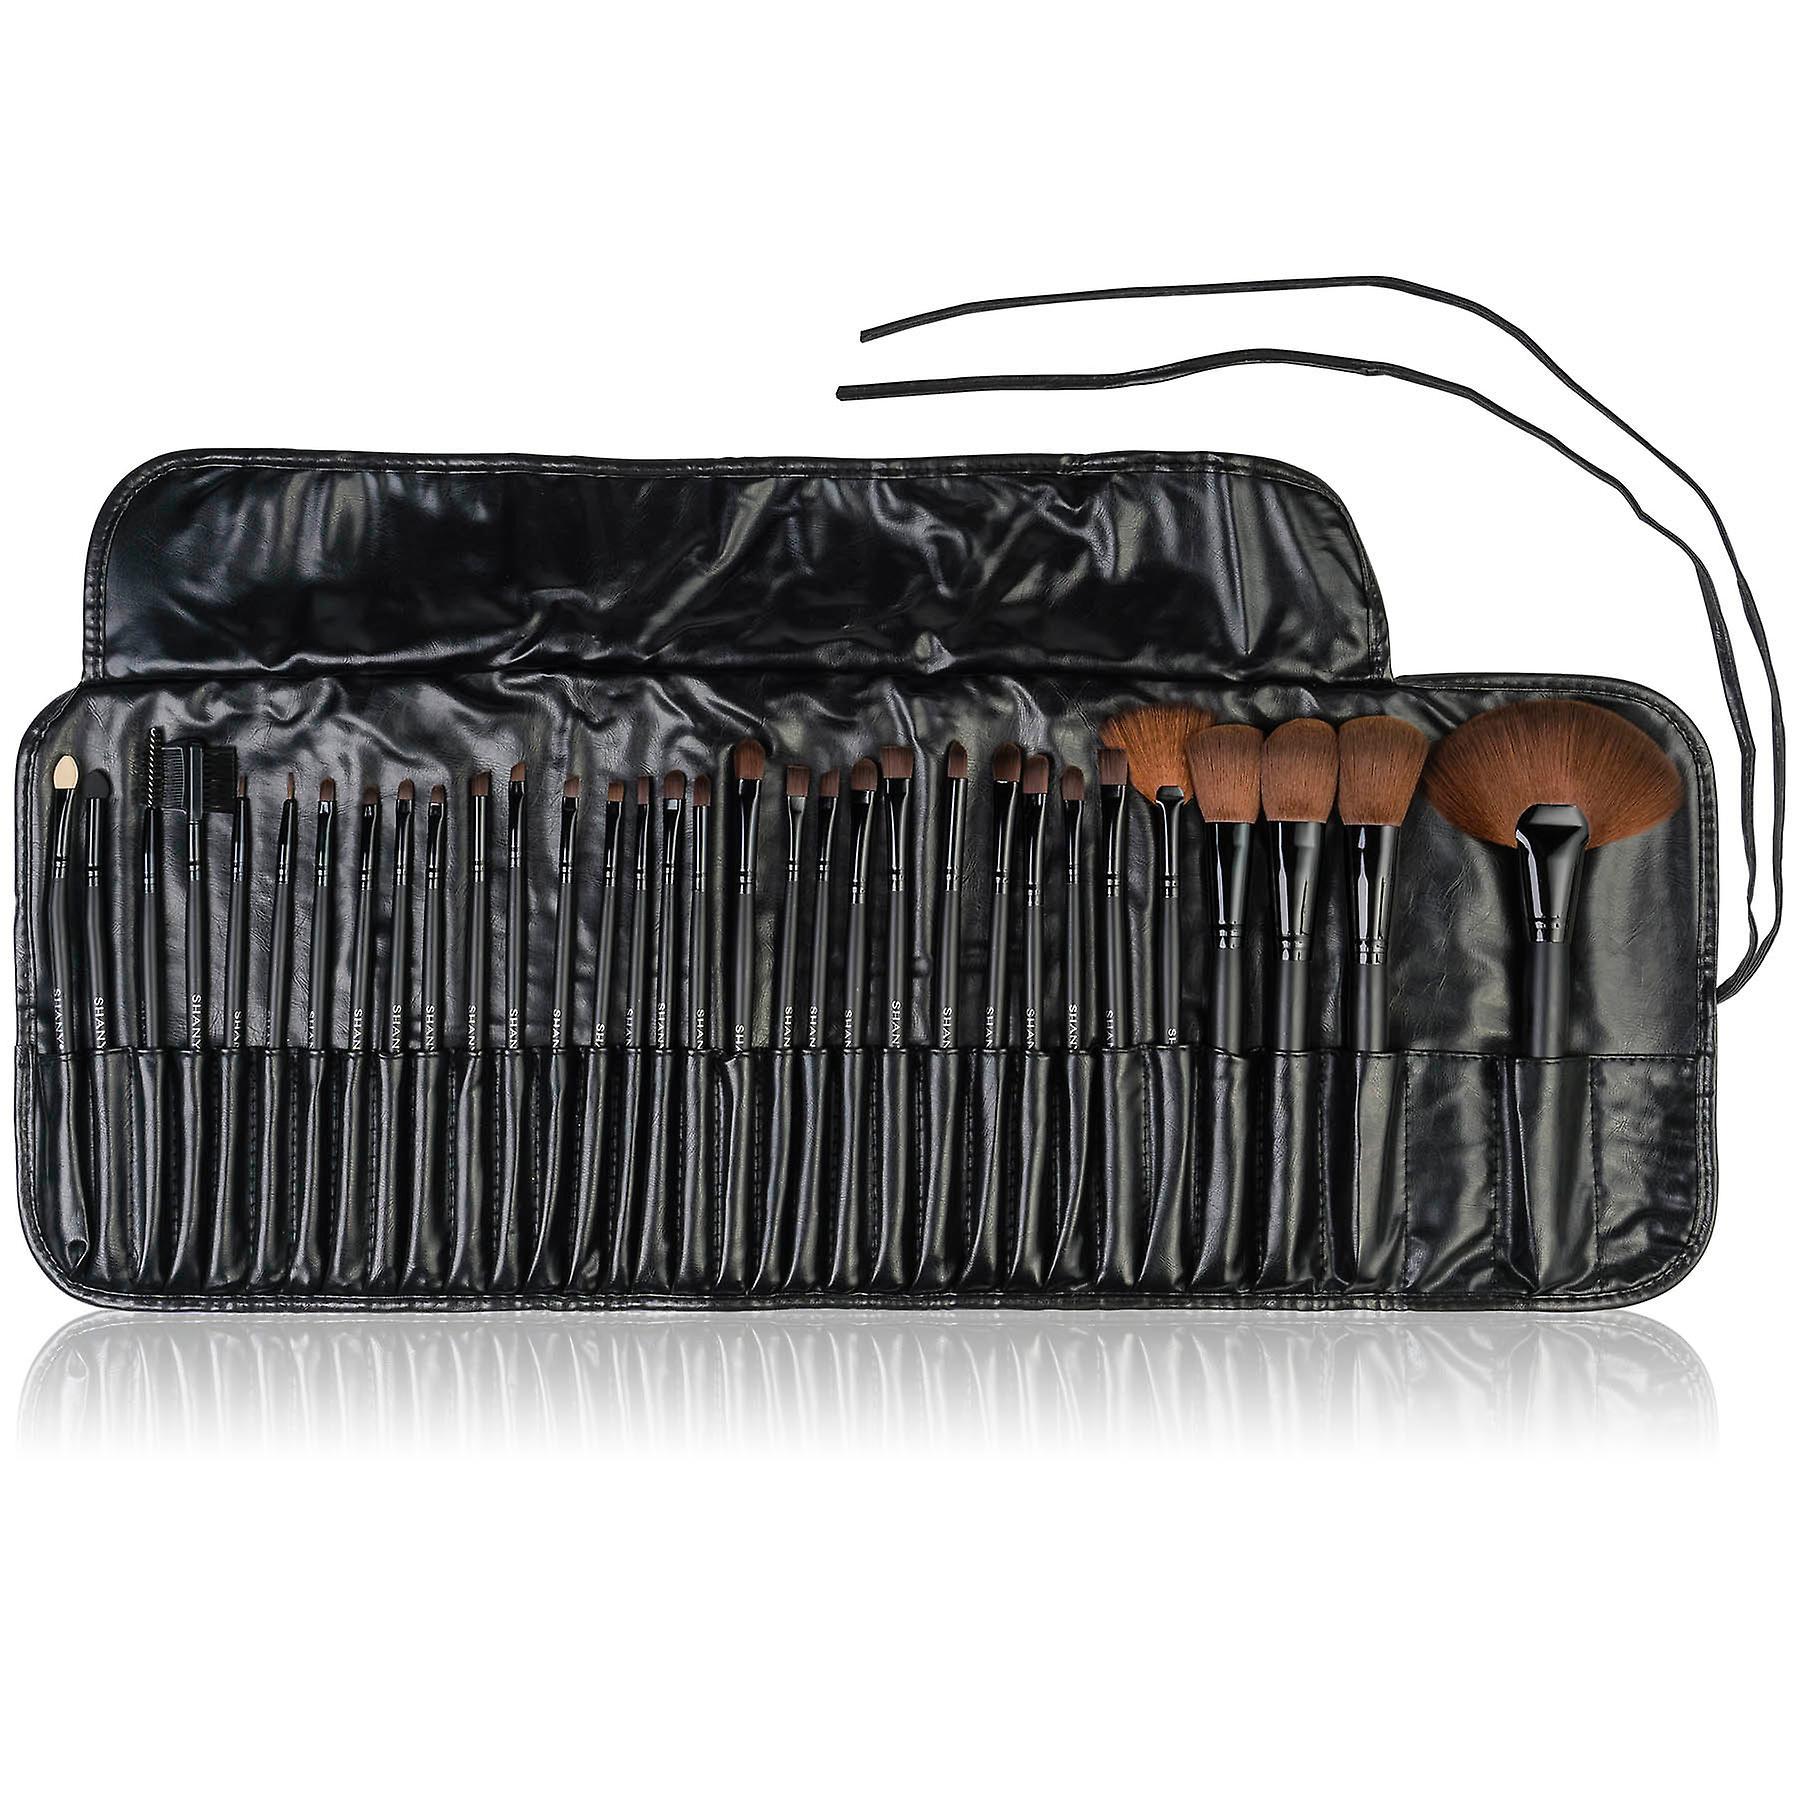 ShanY Professional Brush Set avec Faux Leather Pouch, 32 Comte, Bristles synthétiques